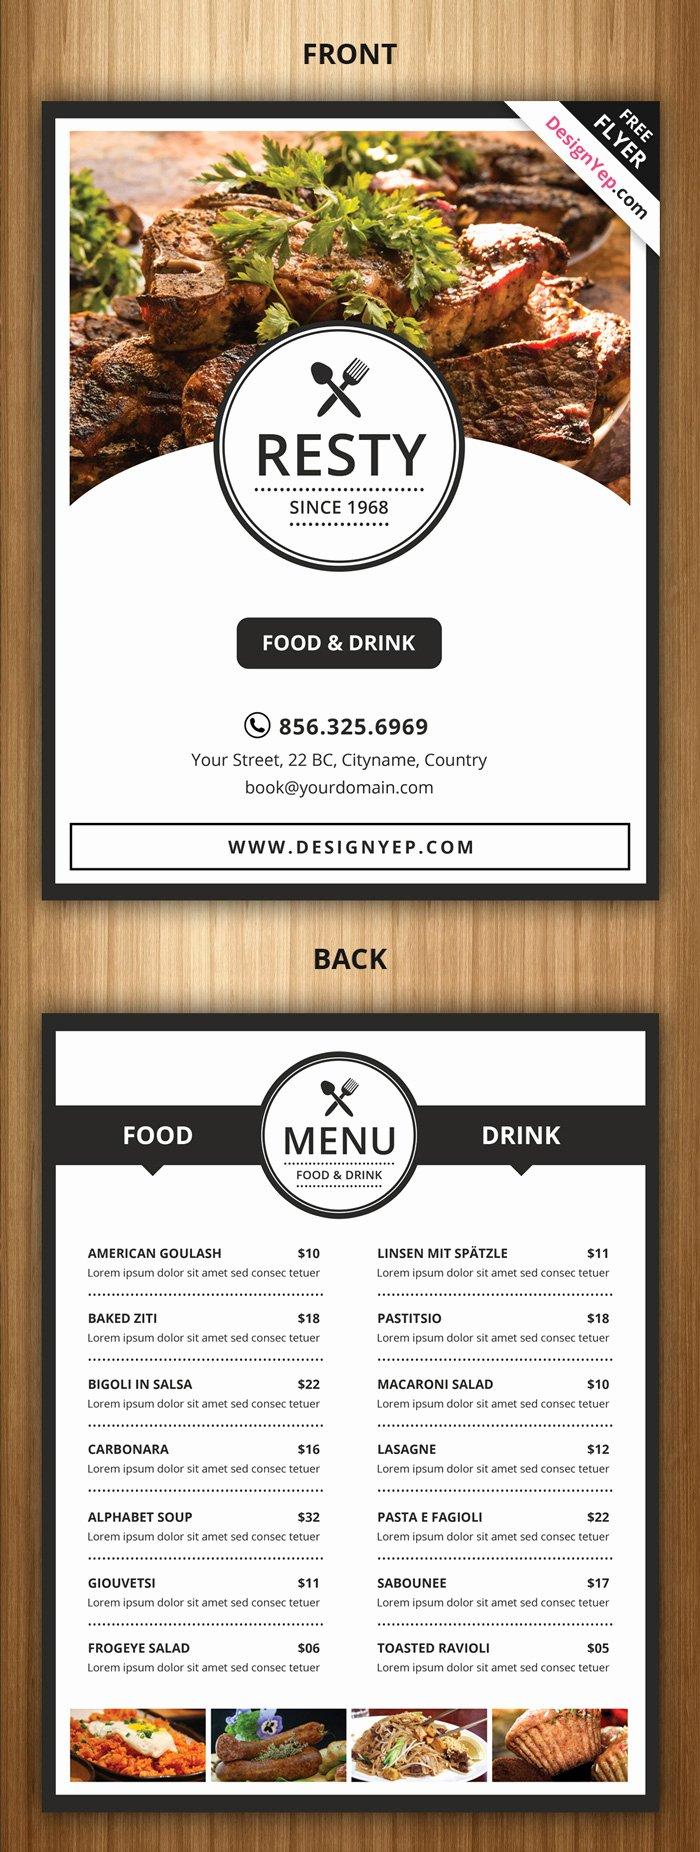 21 Free Food Menu Templates for Restaurants Designyep